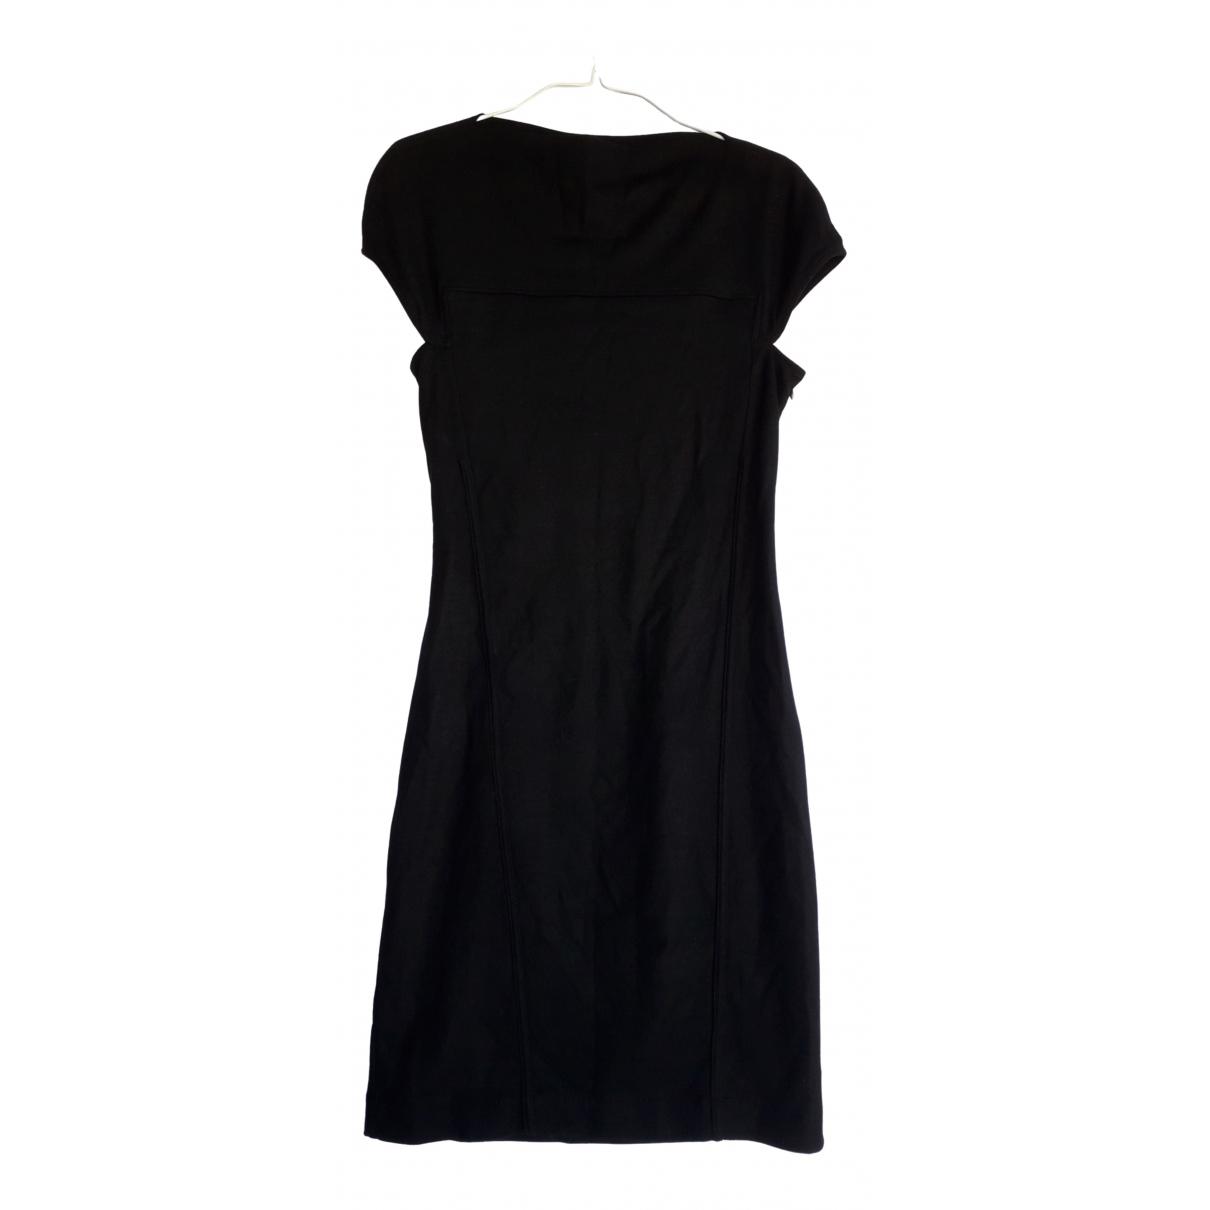 Givenchy \N Kleid in  Schwarz Wolle